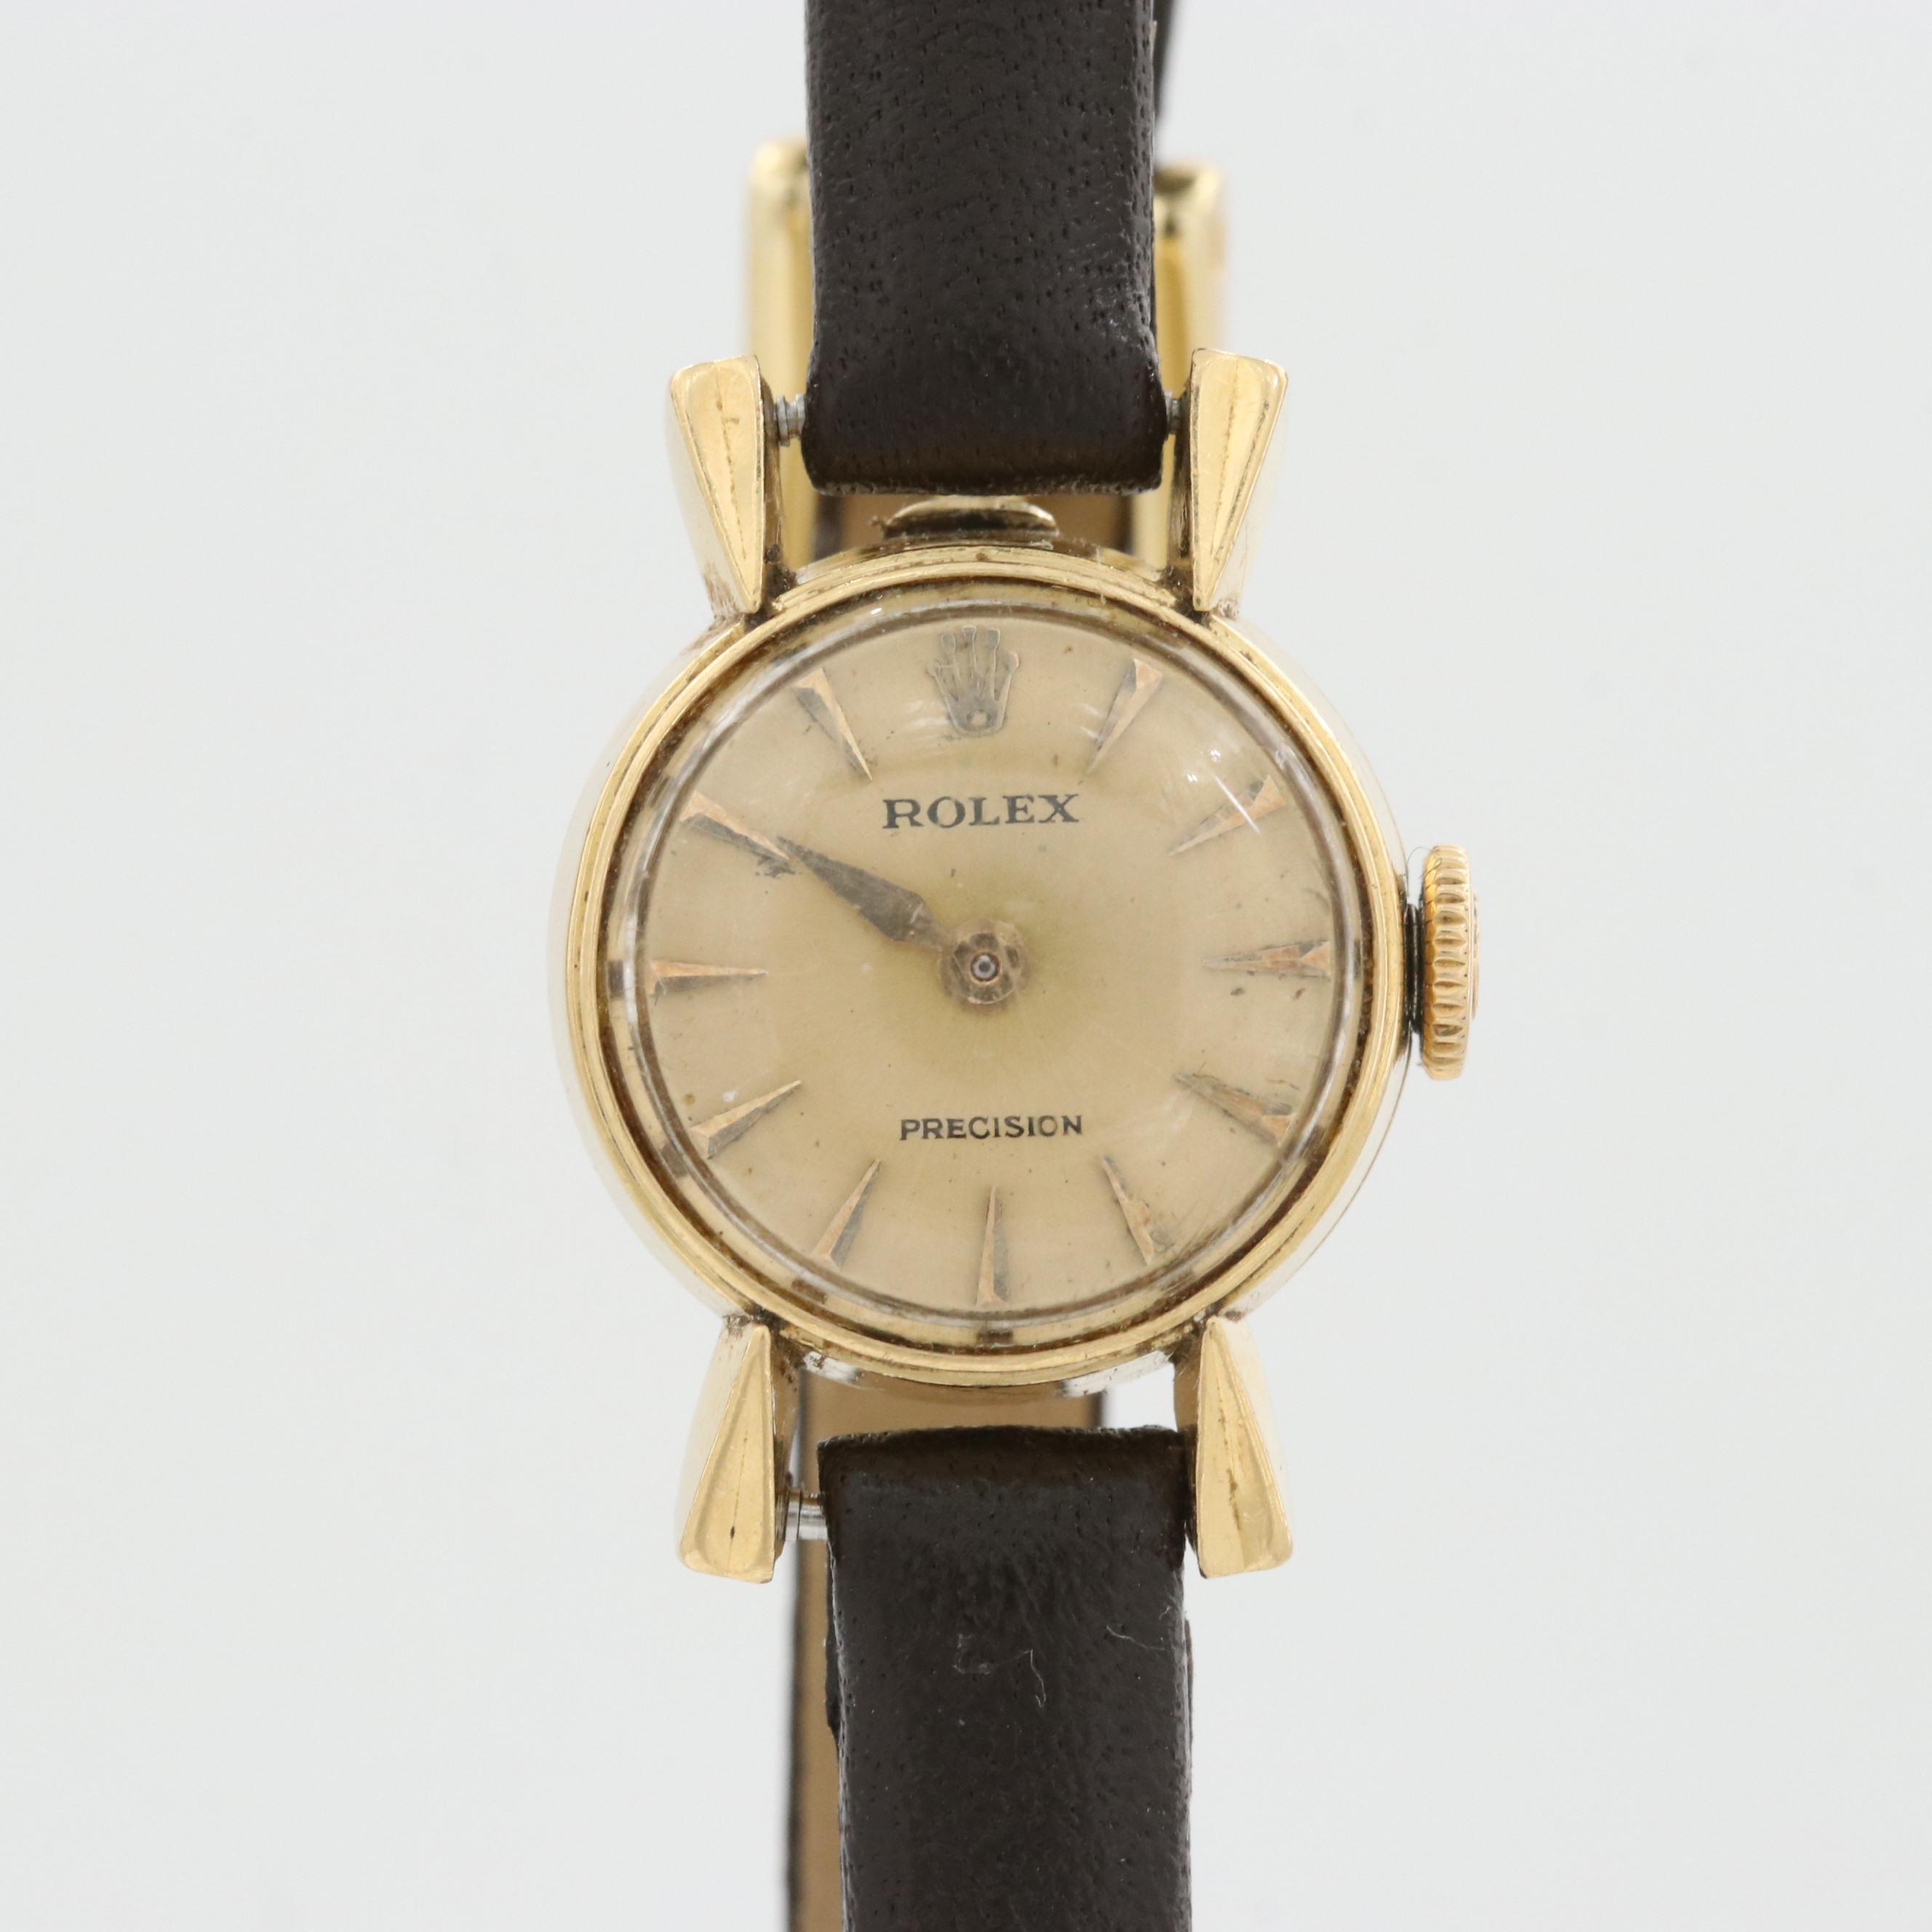 Vintage Rolex Precision Cocktail 18K Yellow Gold Stem Wind Wristwatch